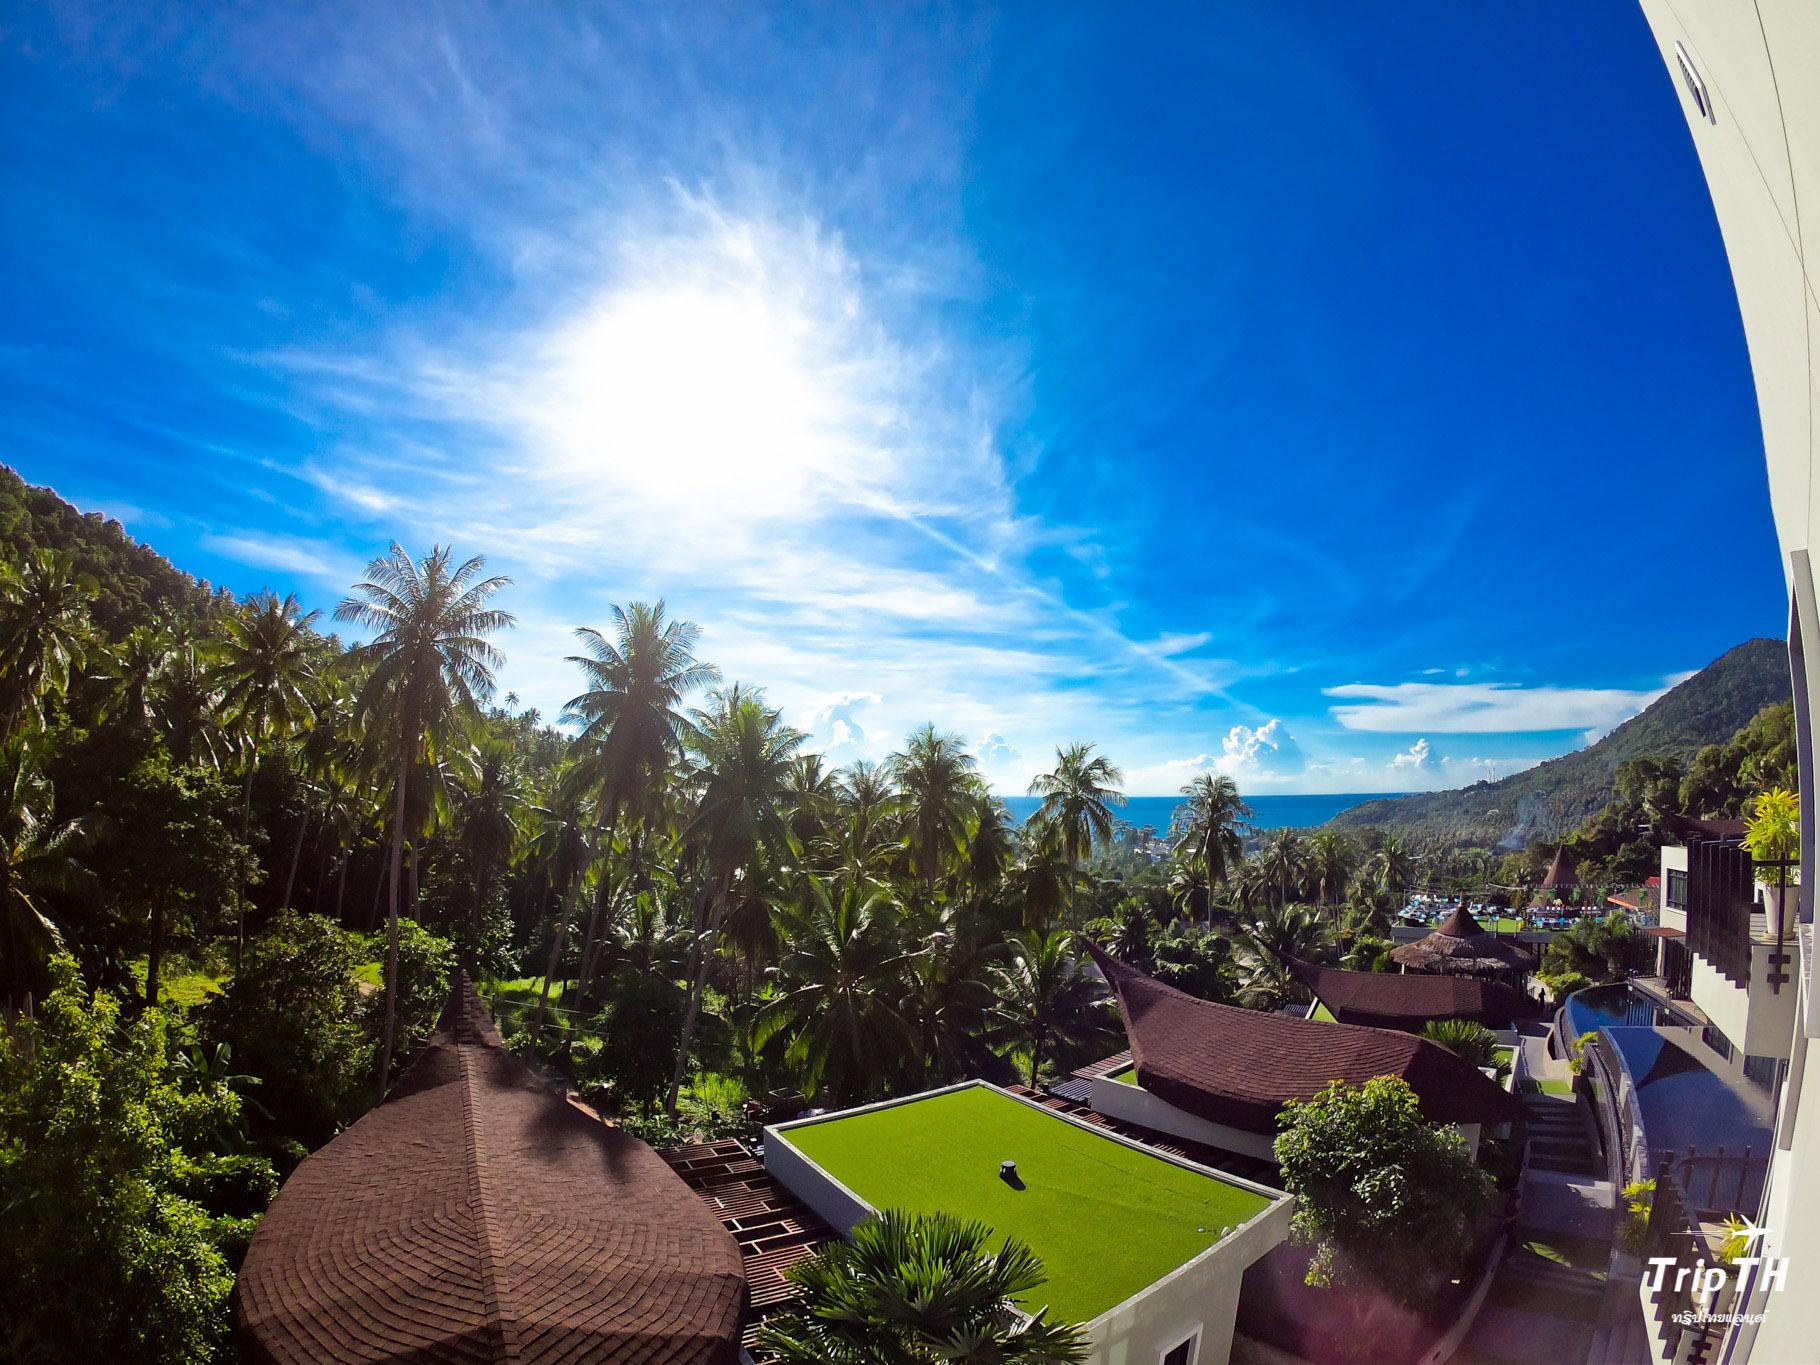 The Tarna Align Resort